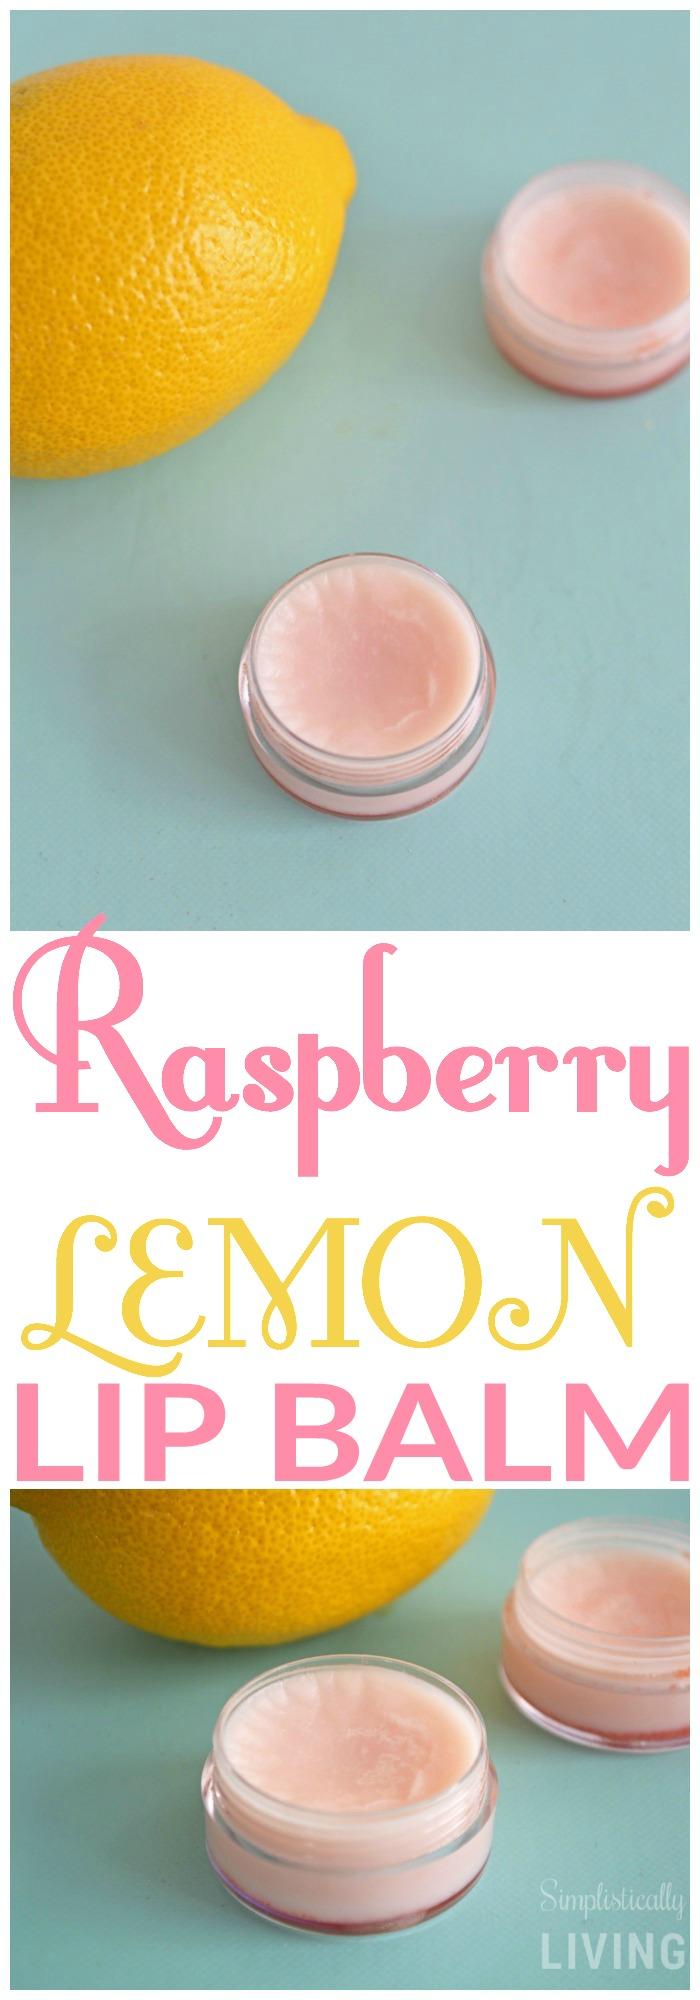 Raspberry lemon lip balm